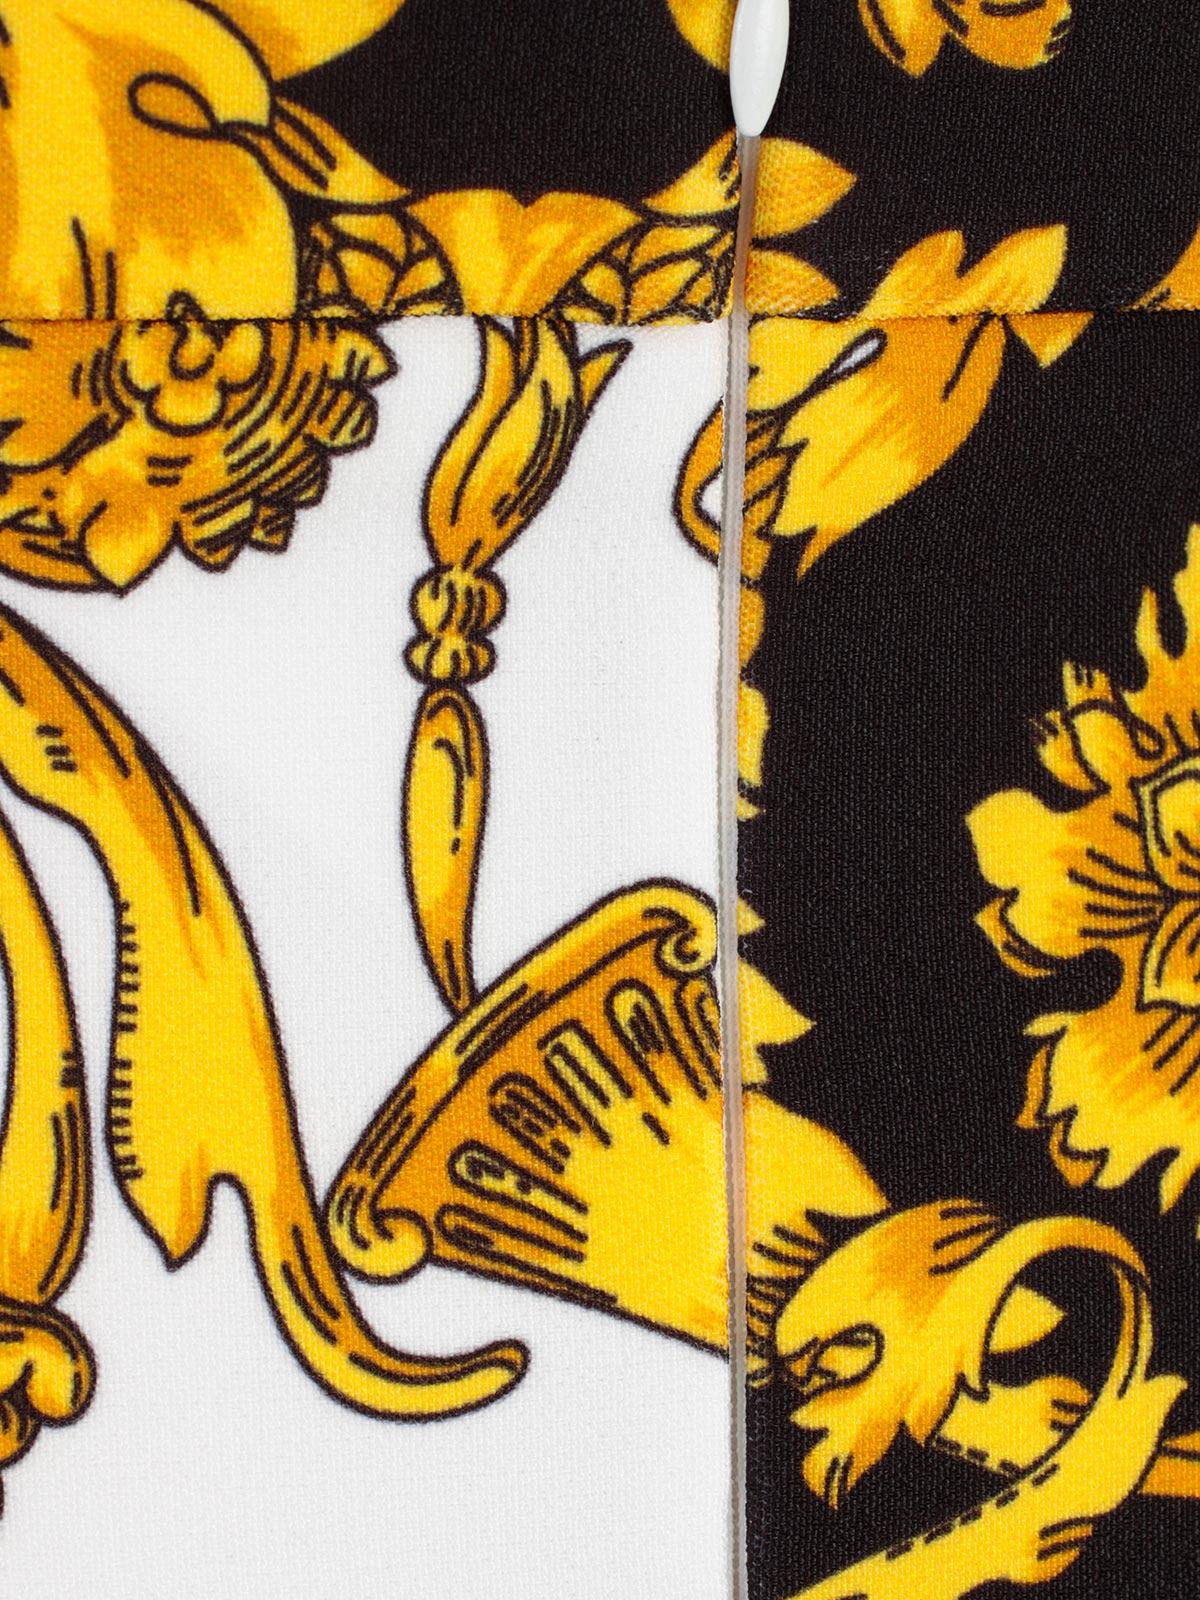 dd823965 Parosh P.a.r.o.s.h. Baroque Print Skirt - Fant Blk - 10765519   italist